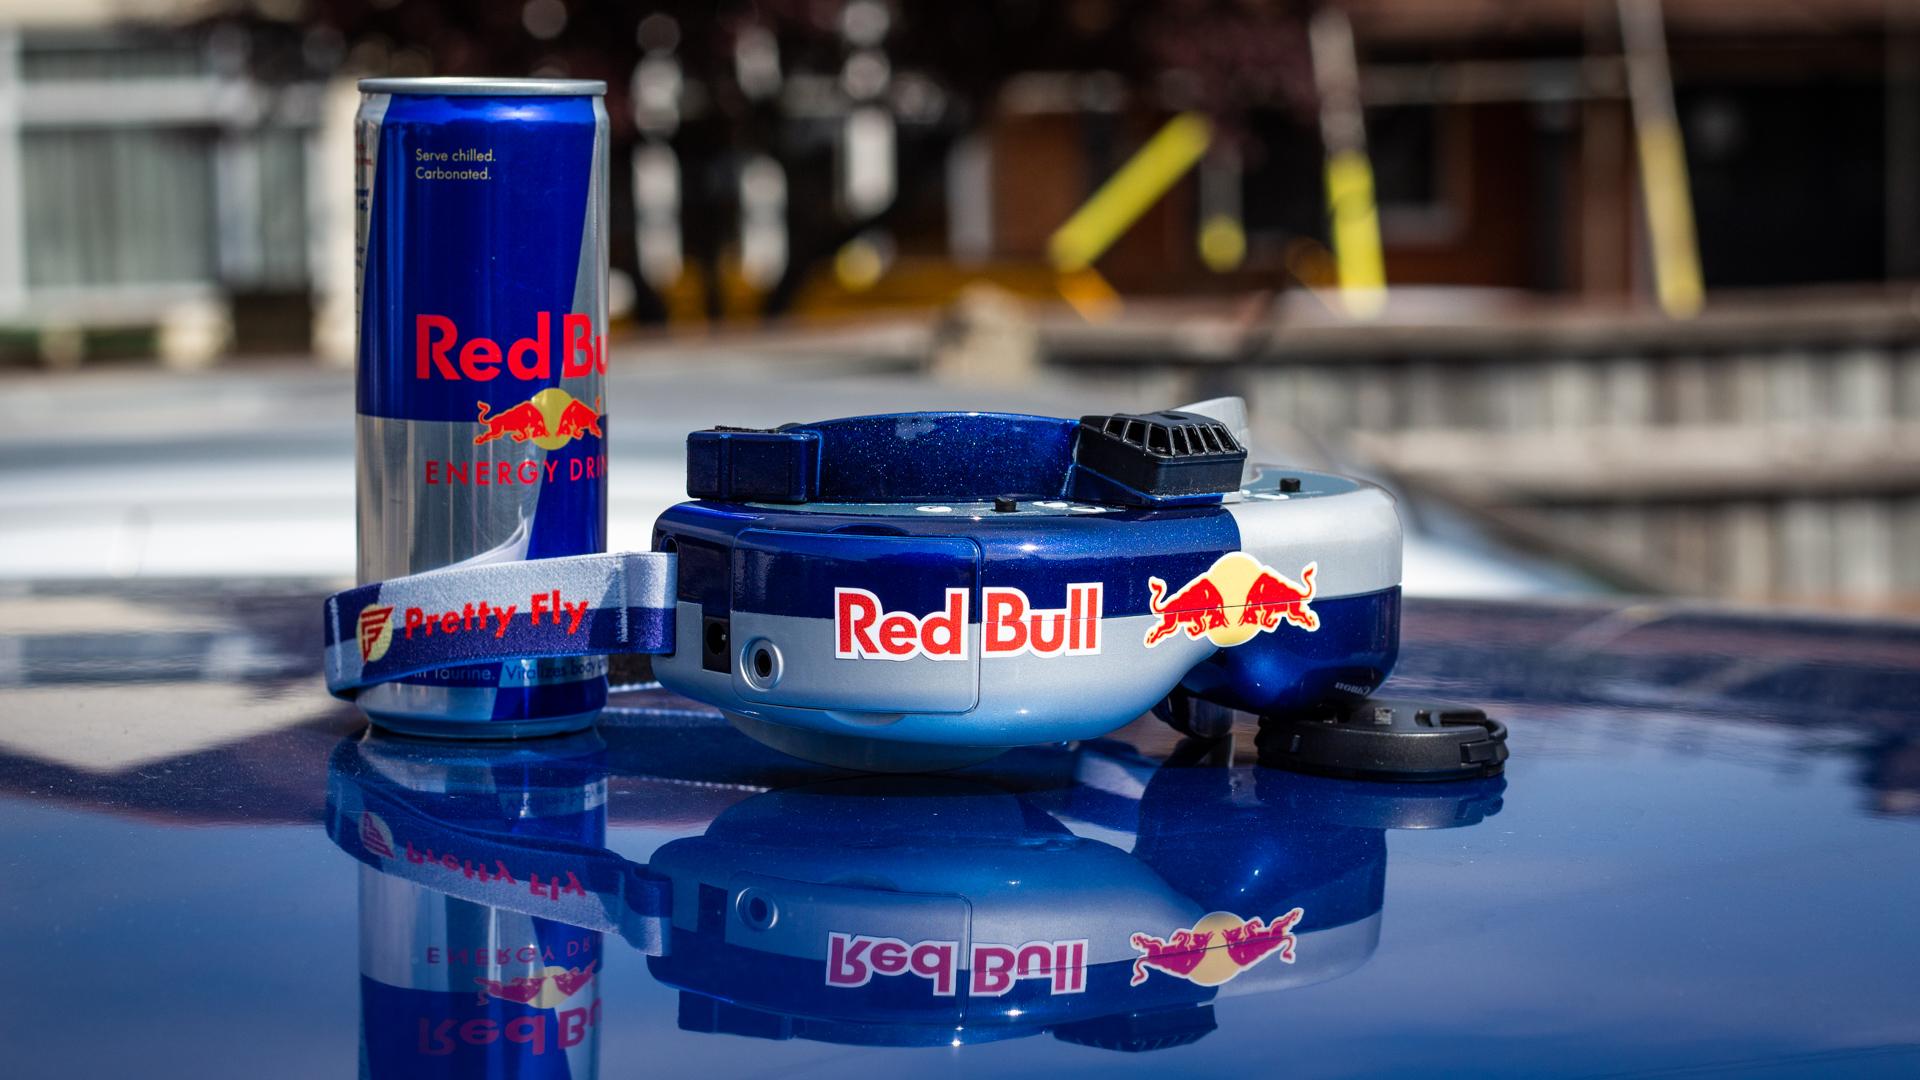 Red Bull FPV goggles